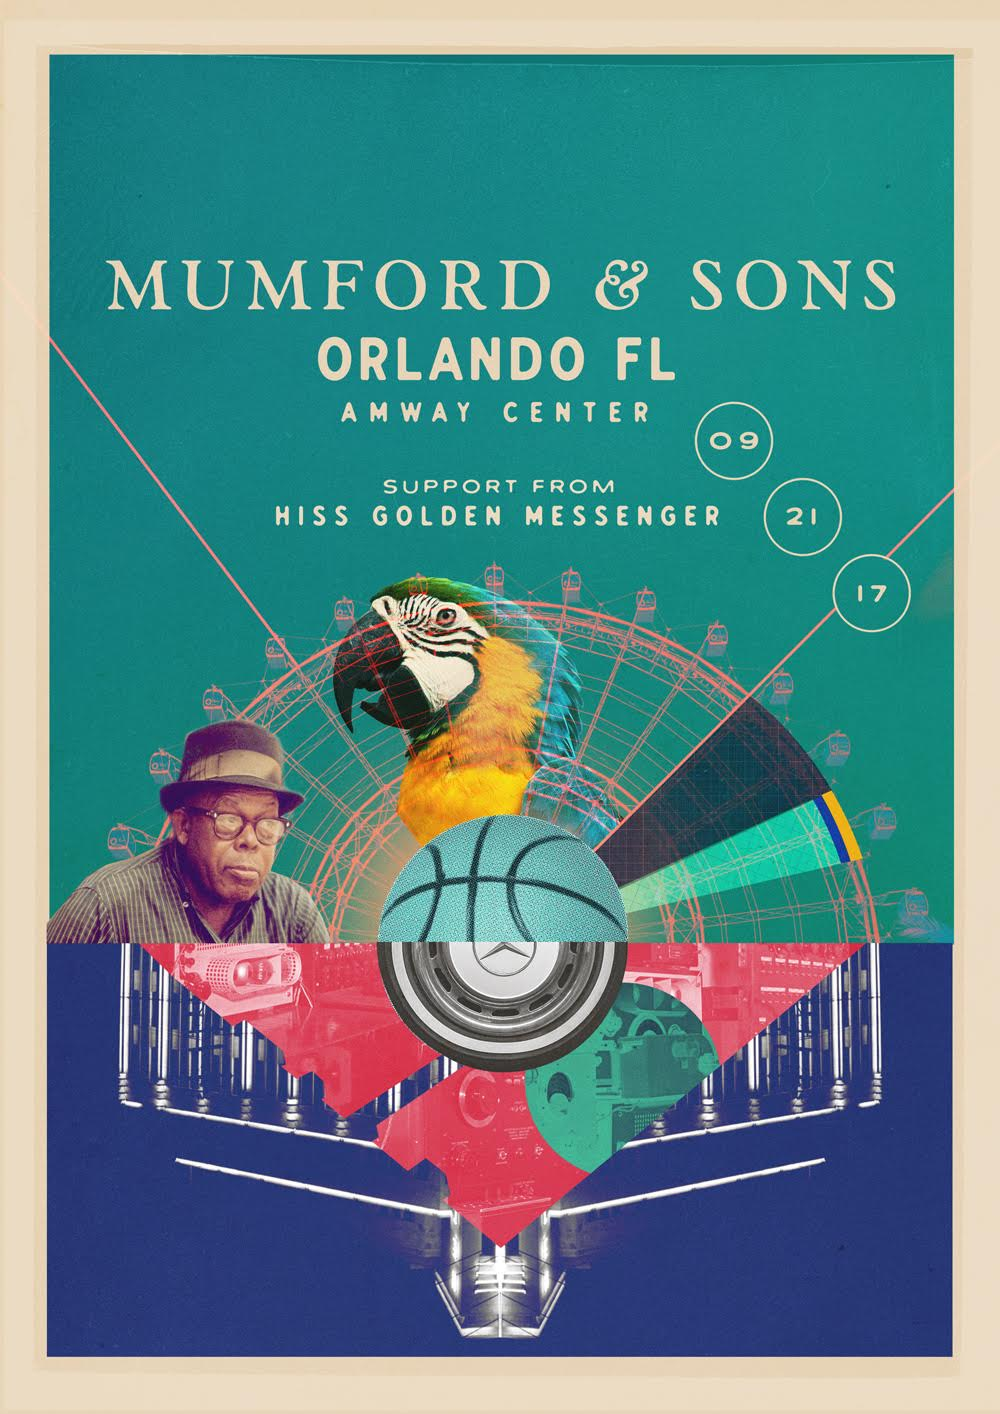 MS_09_21_Orlando_FL